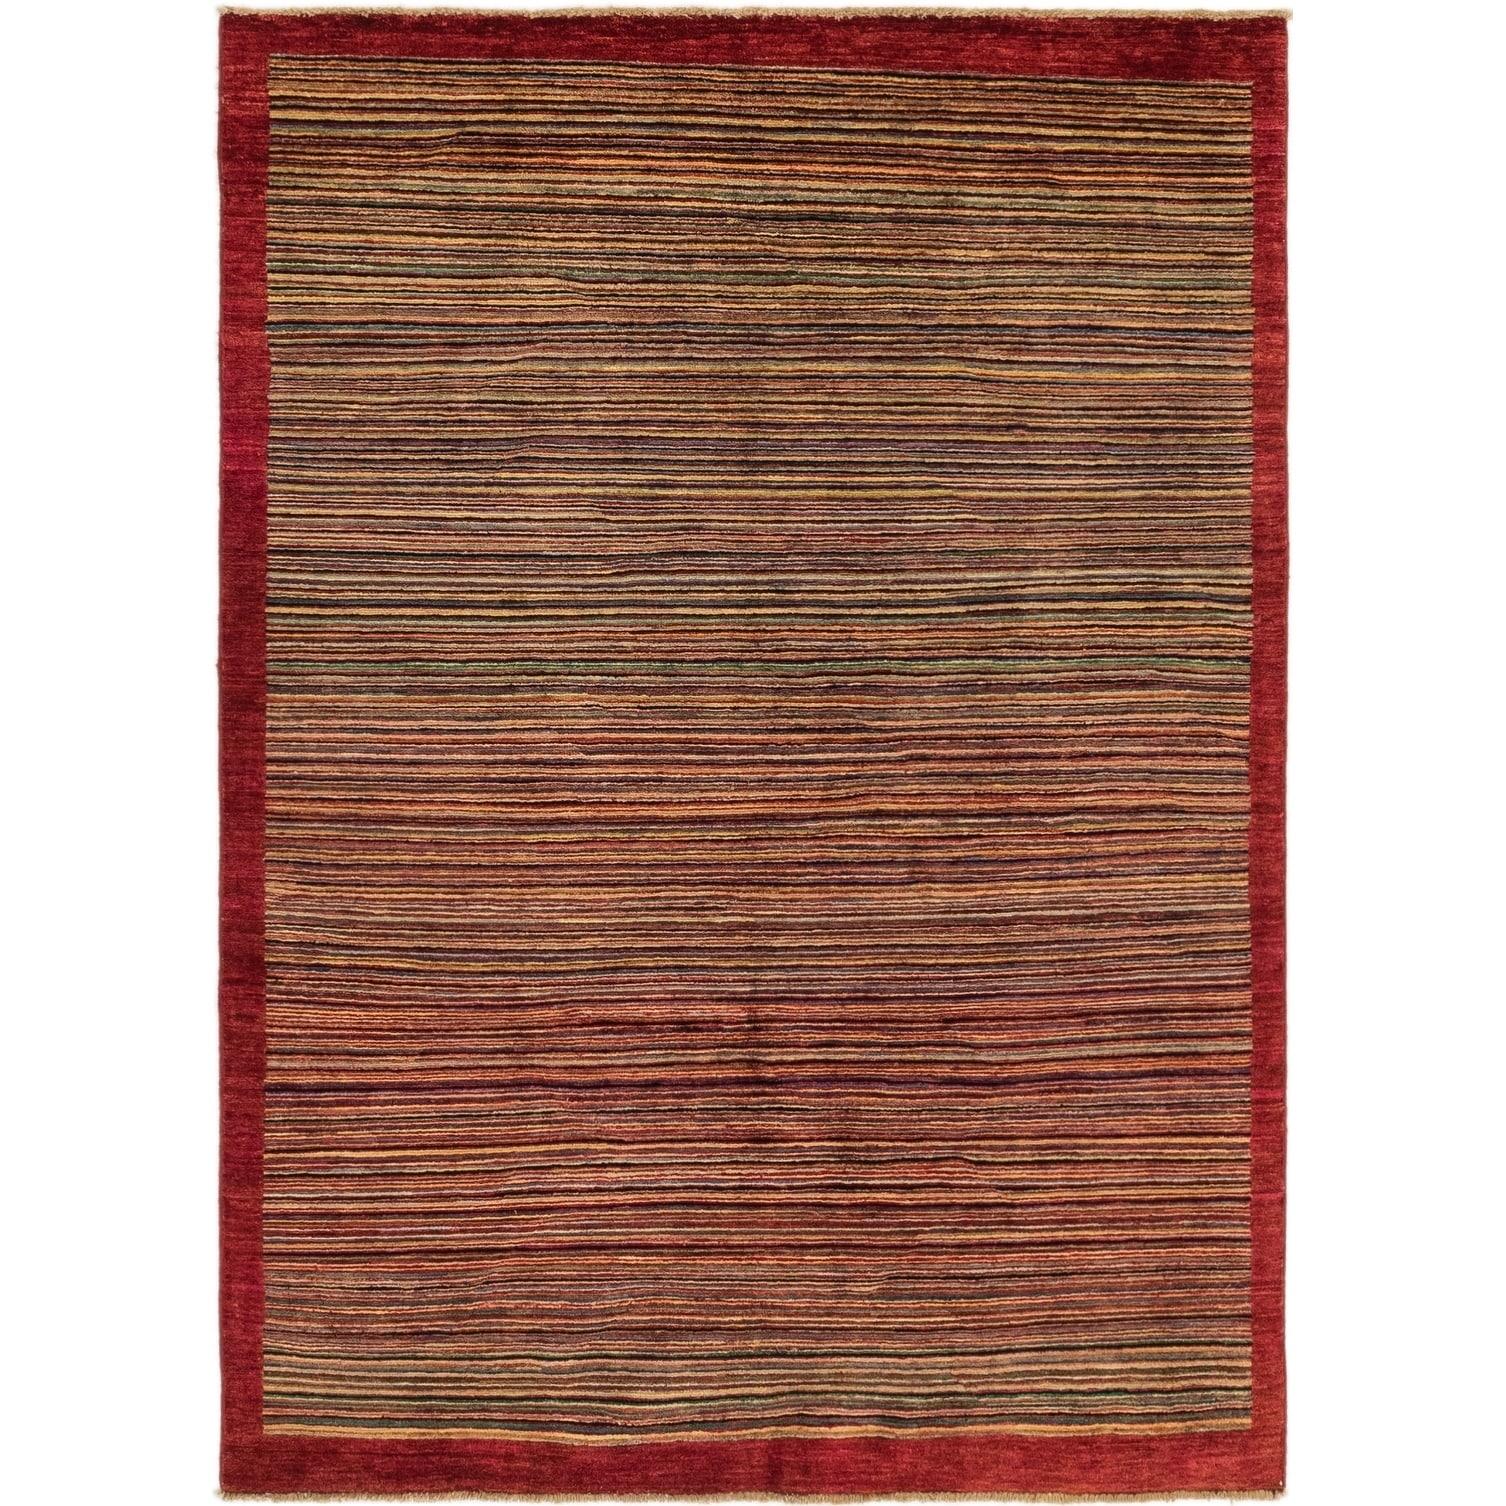 Hand Knotted Kashkuli Gabbeh Wool Area Rug - Multi - 4 7 x 6 2 (Multi - 4 7 x 6 2)